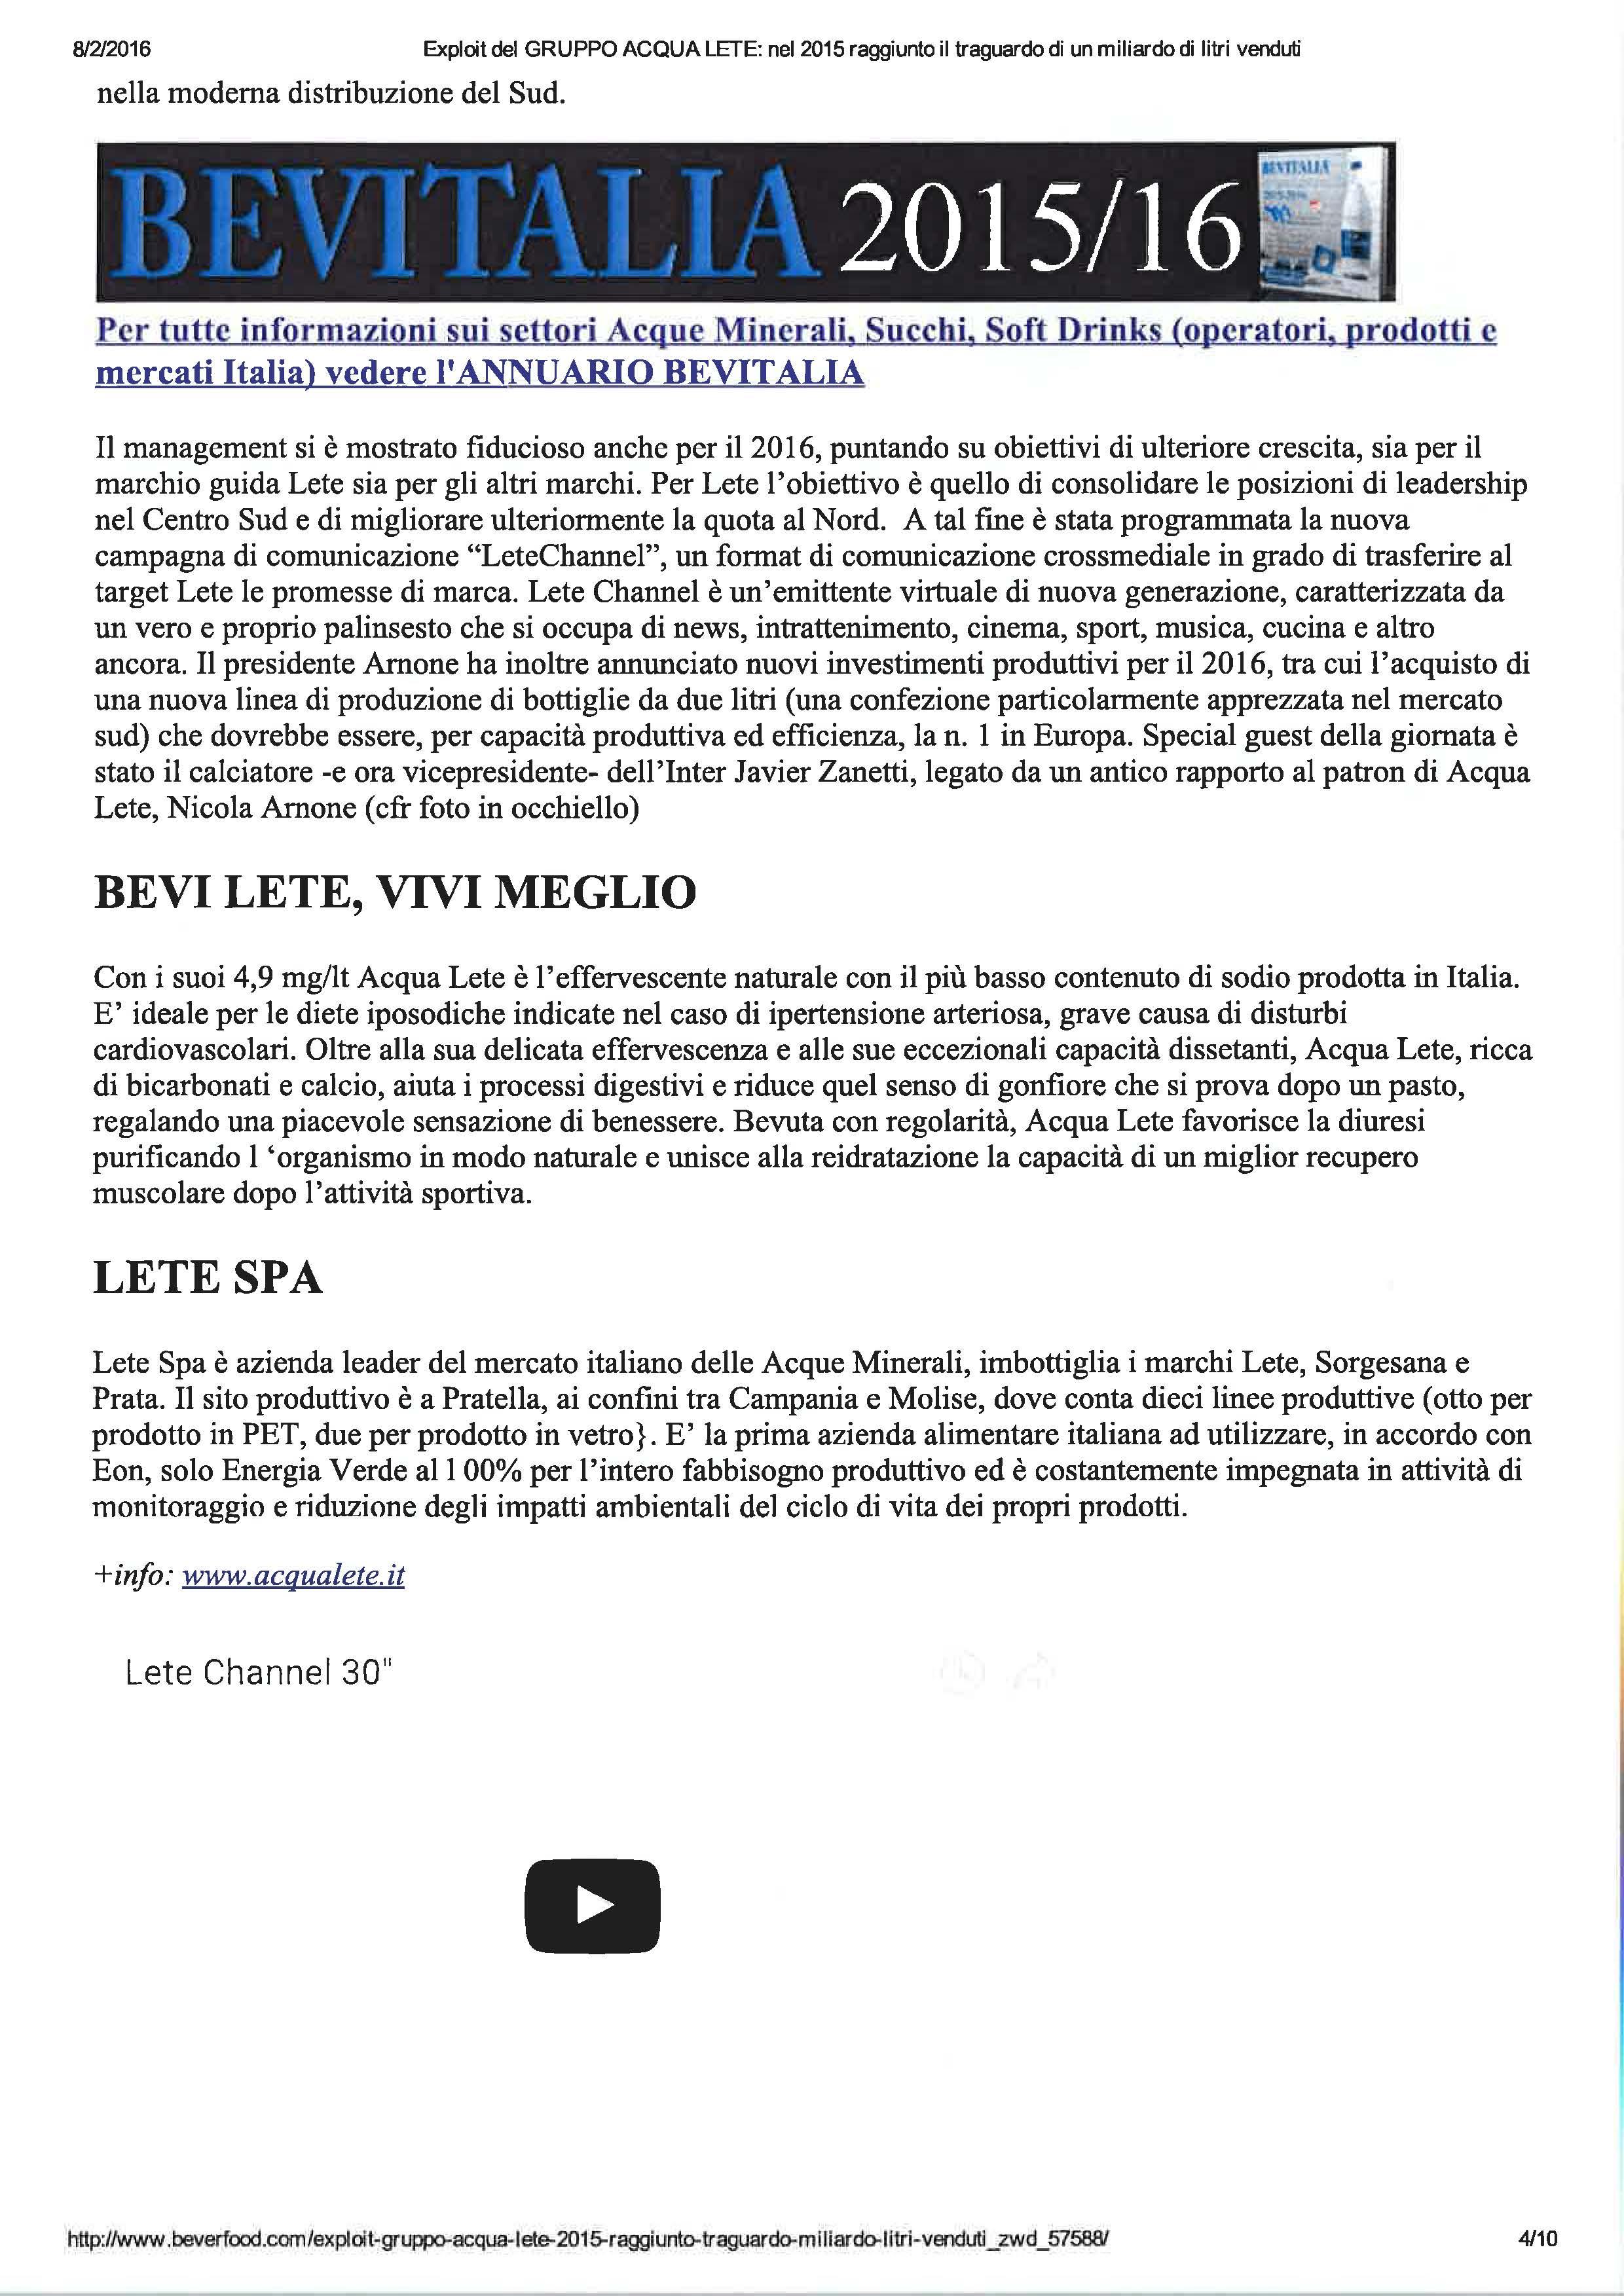 BEVERFOOD_Pagina_2